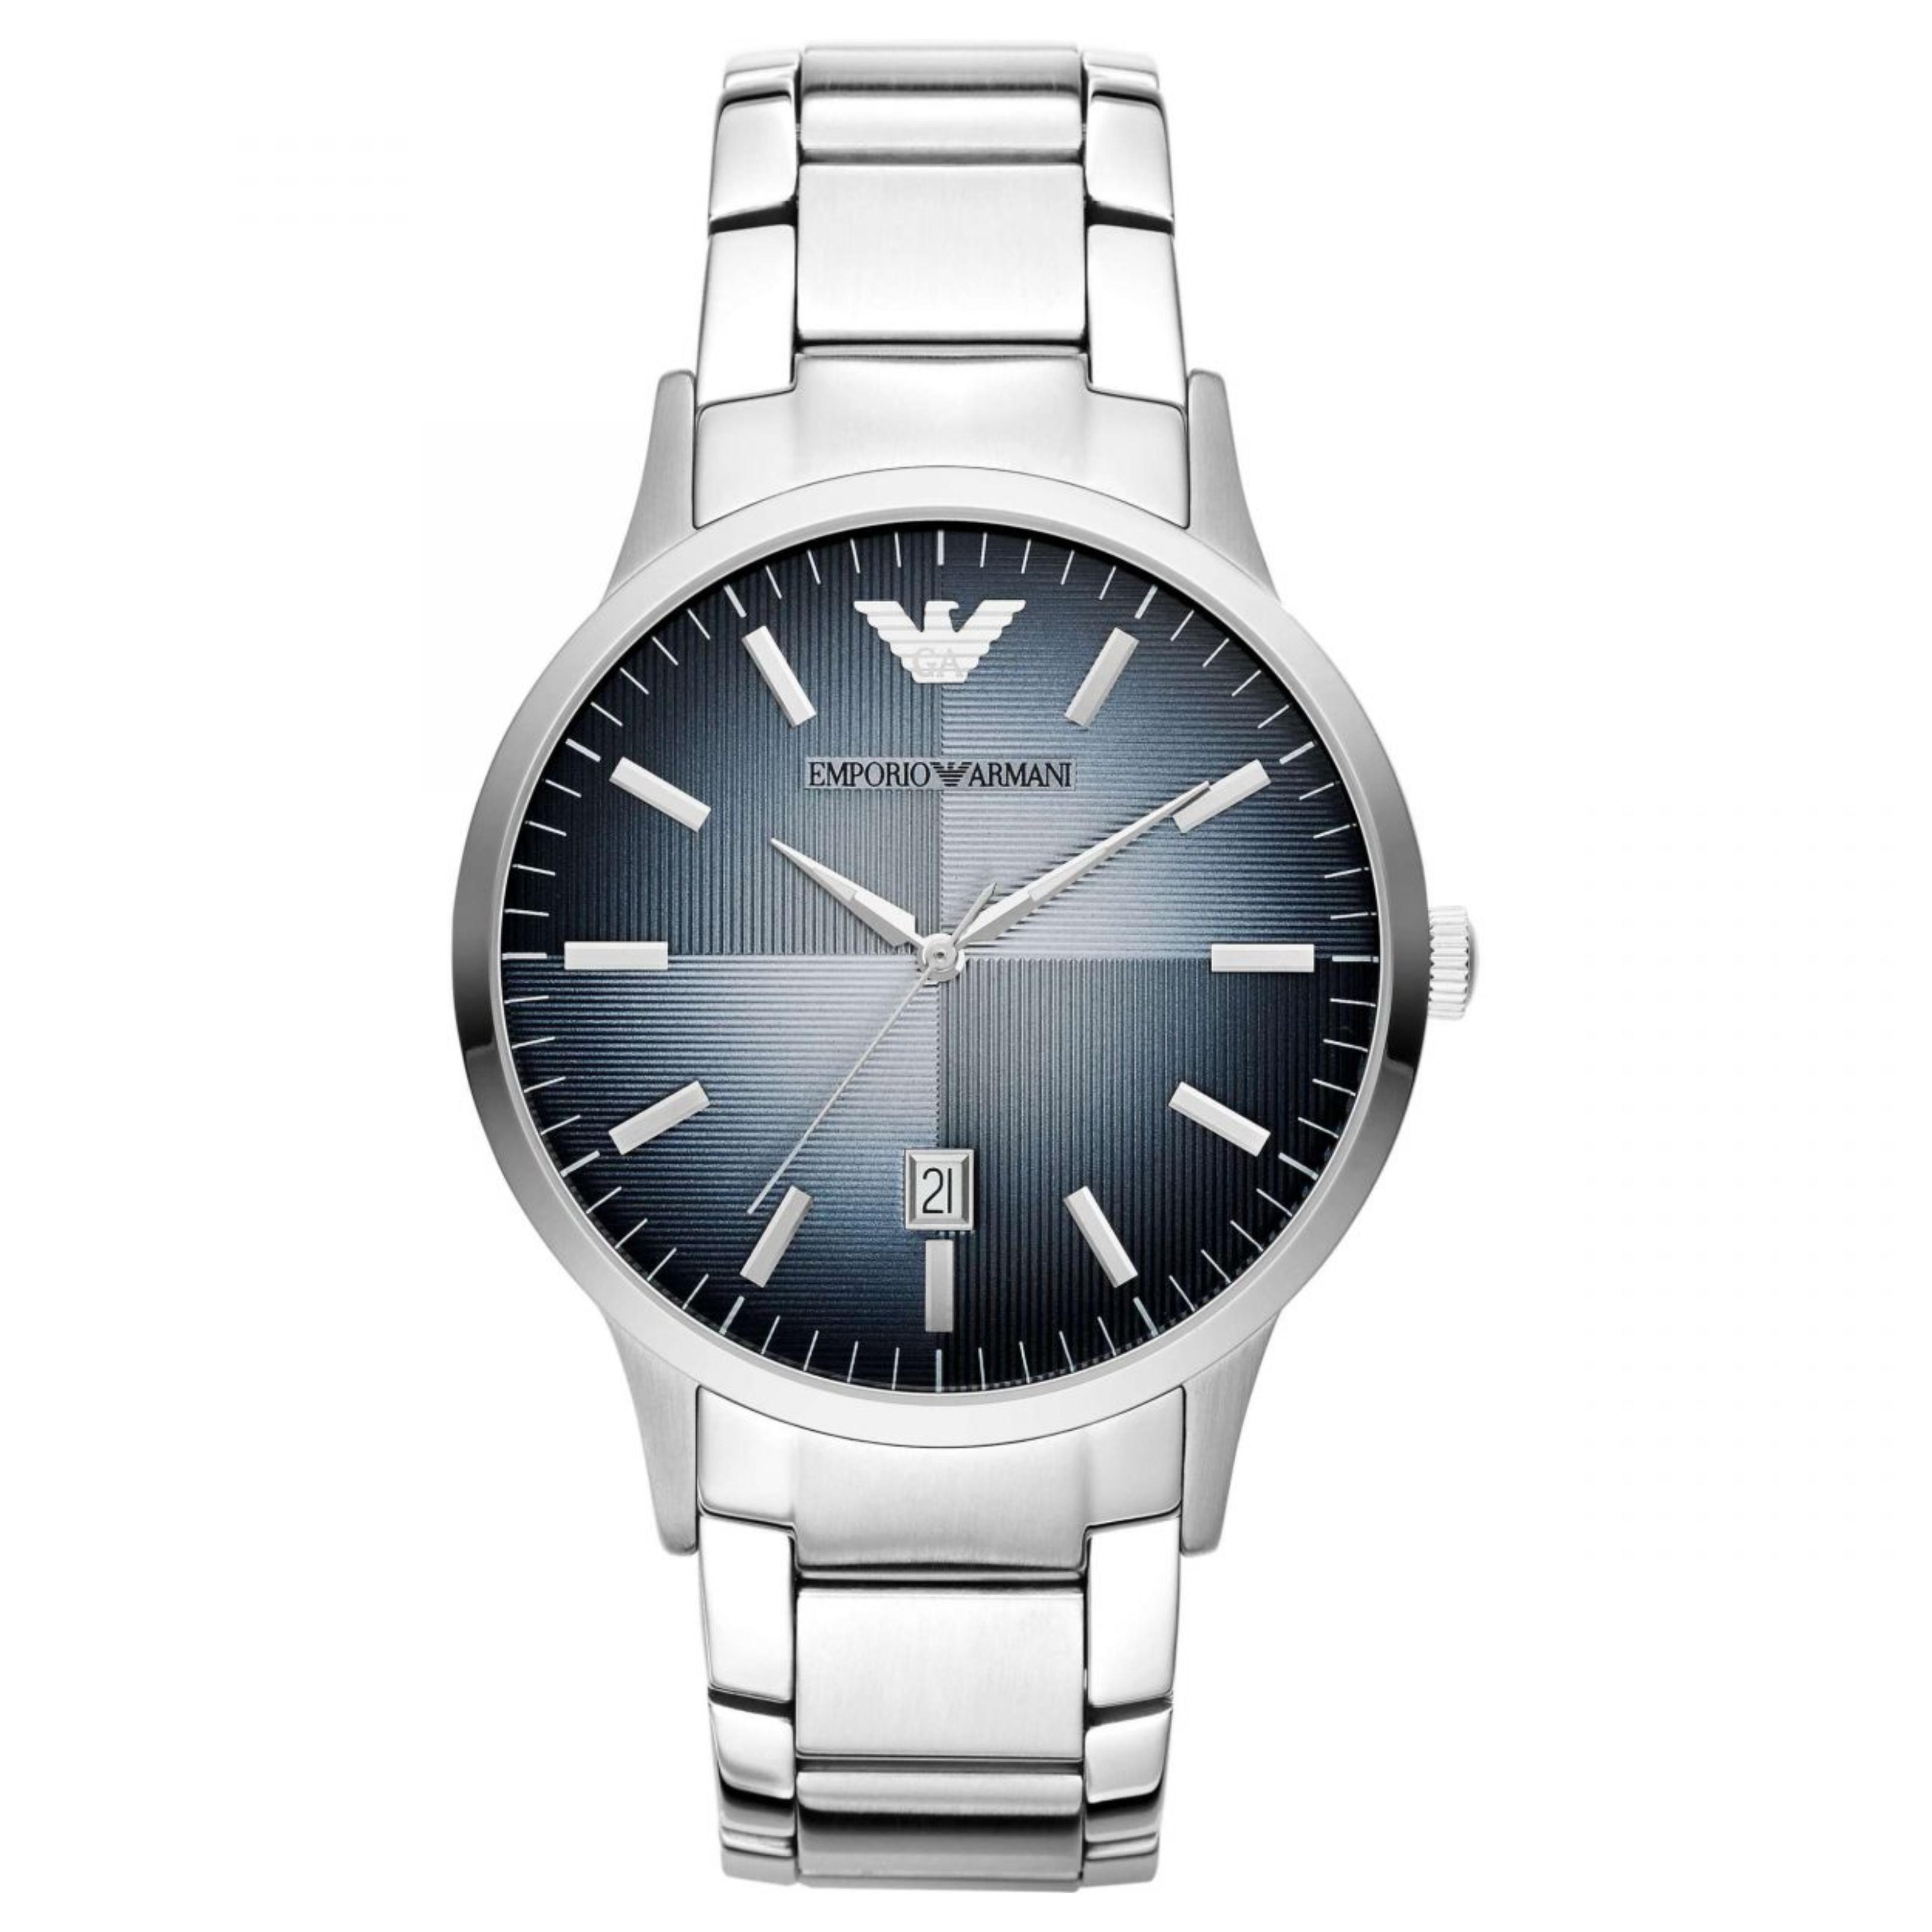 Emporio Armani Classic Men's Watch|Blue Analog Metal Dial|Silver Bracelet|AR247